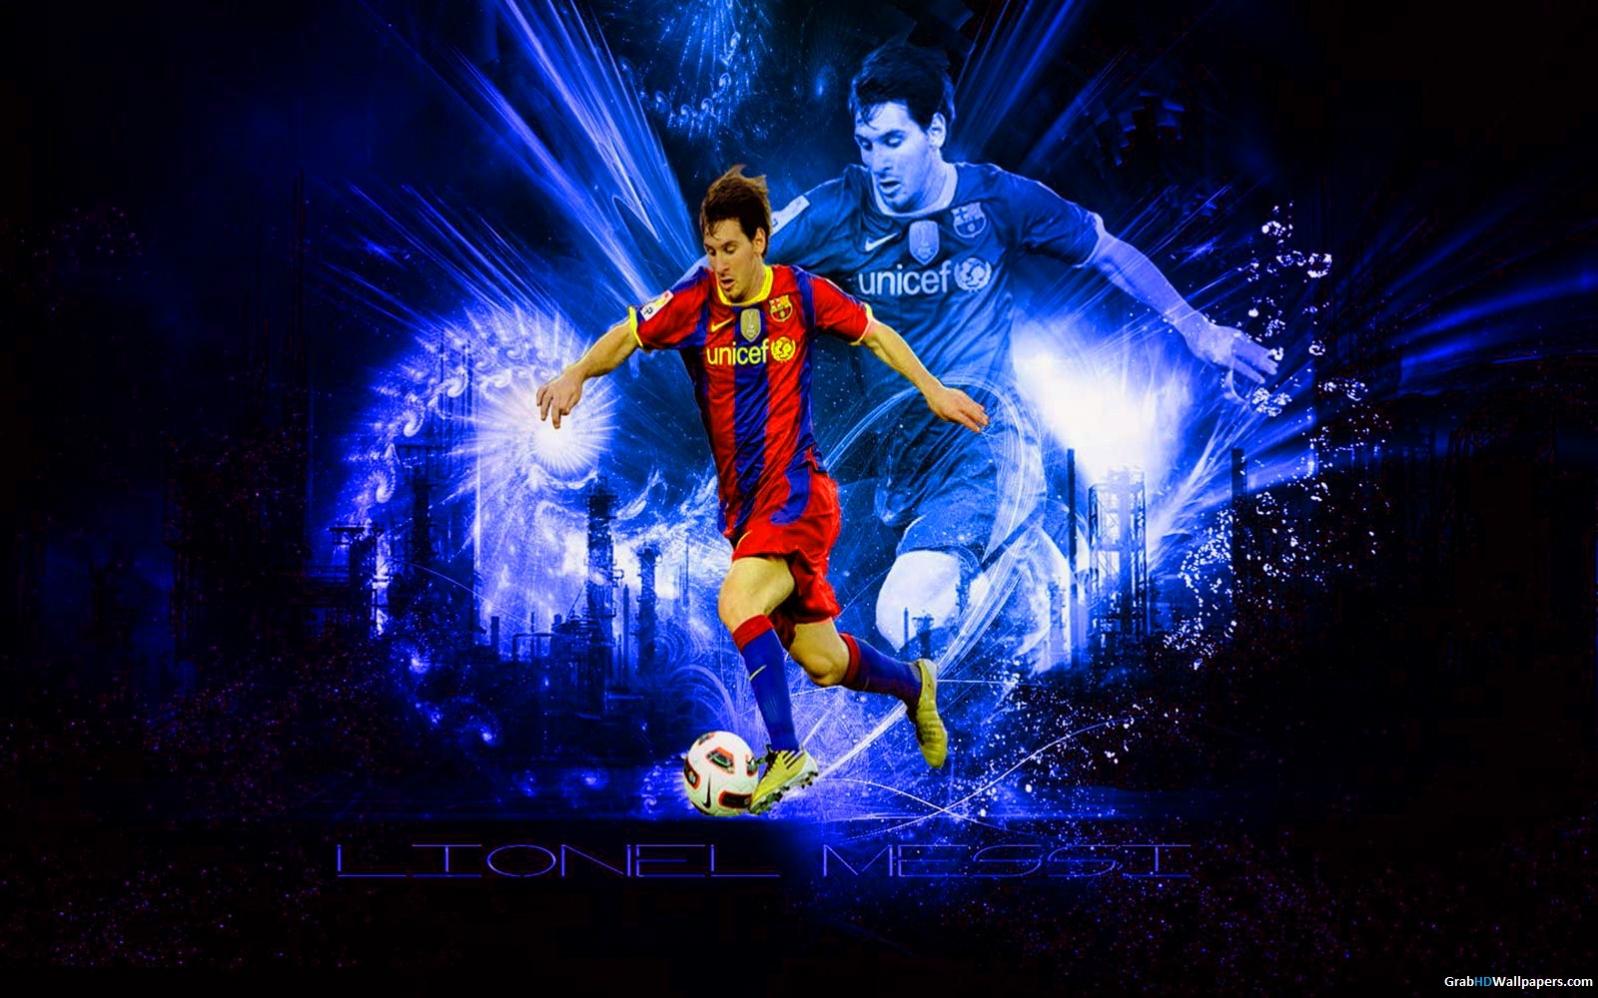 Messi 1080p hd wallpapers Celebrities HD Wallpapers Celebrity HD 1598x998